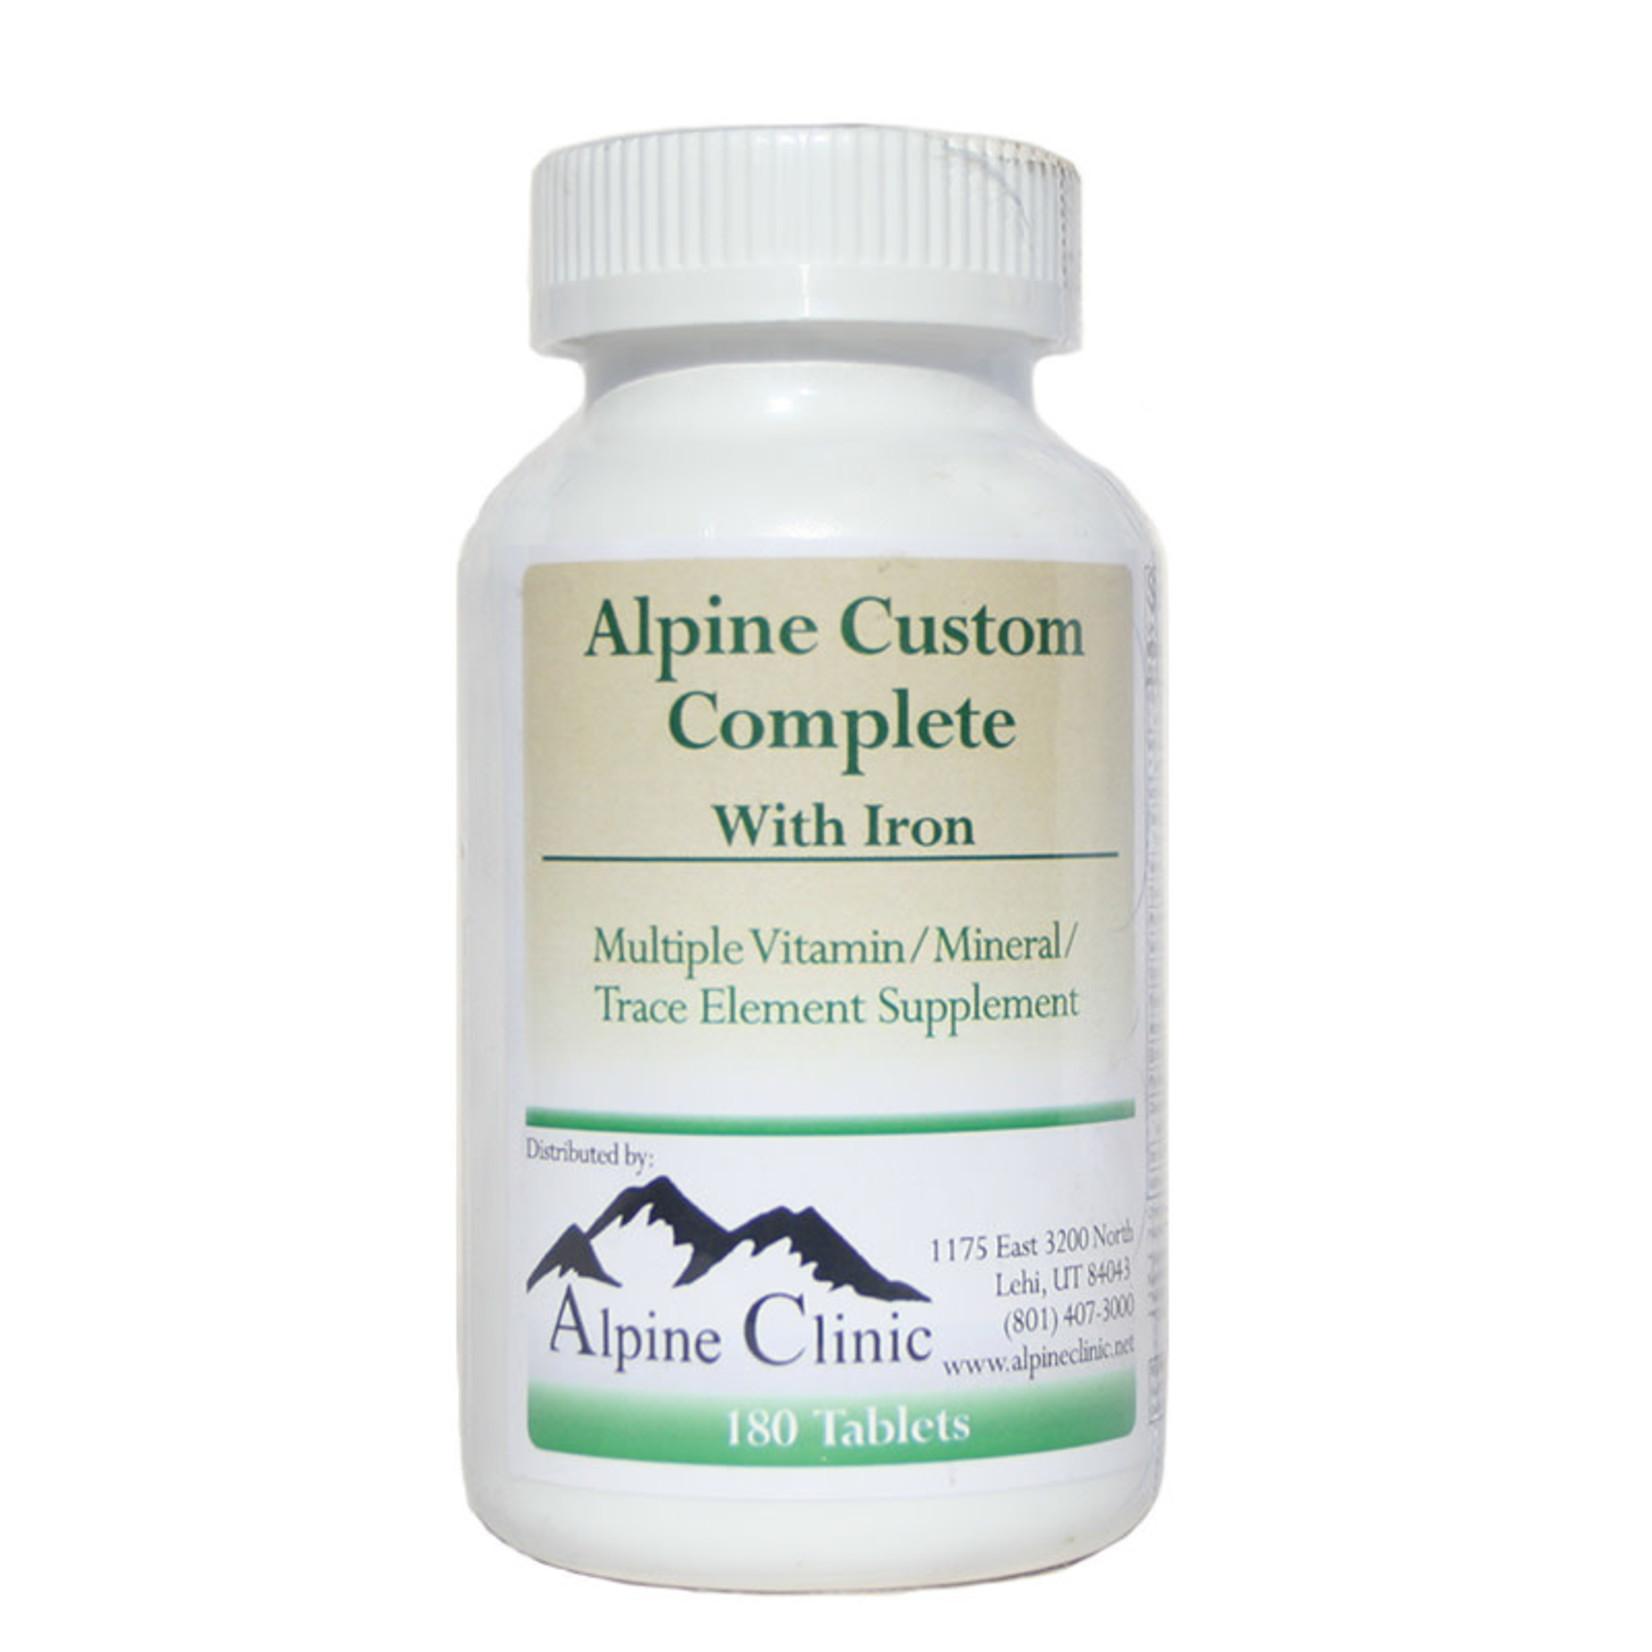 Alpine Clinic PL Alpine Custom Complete With Iron